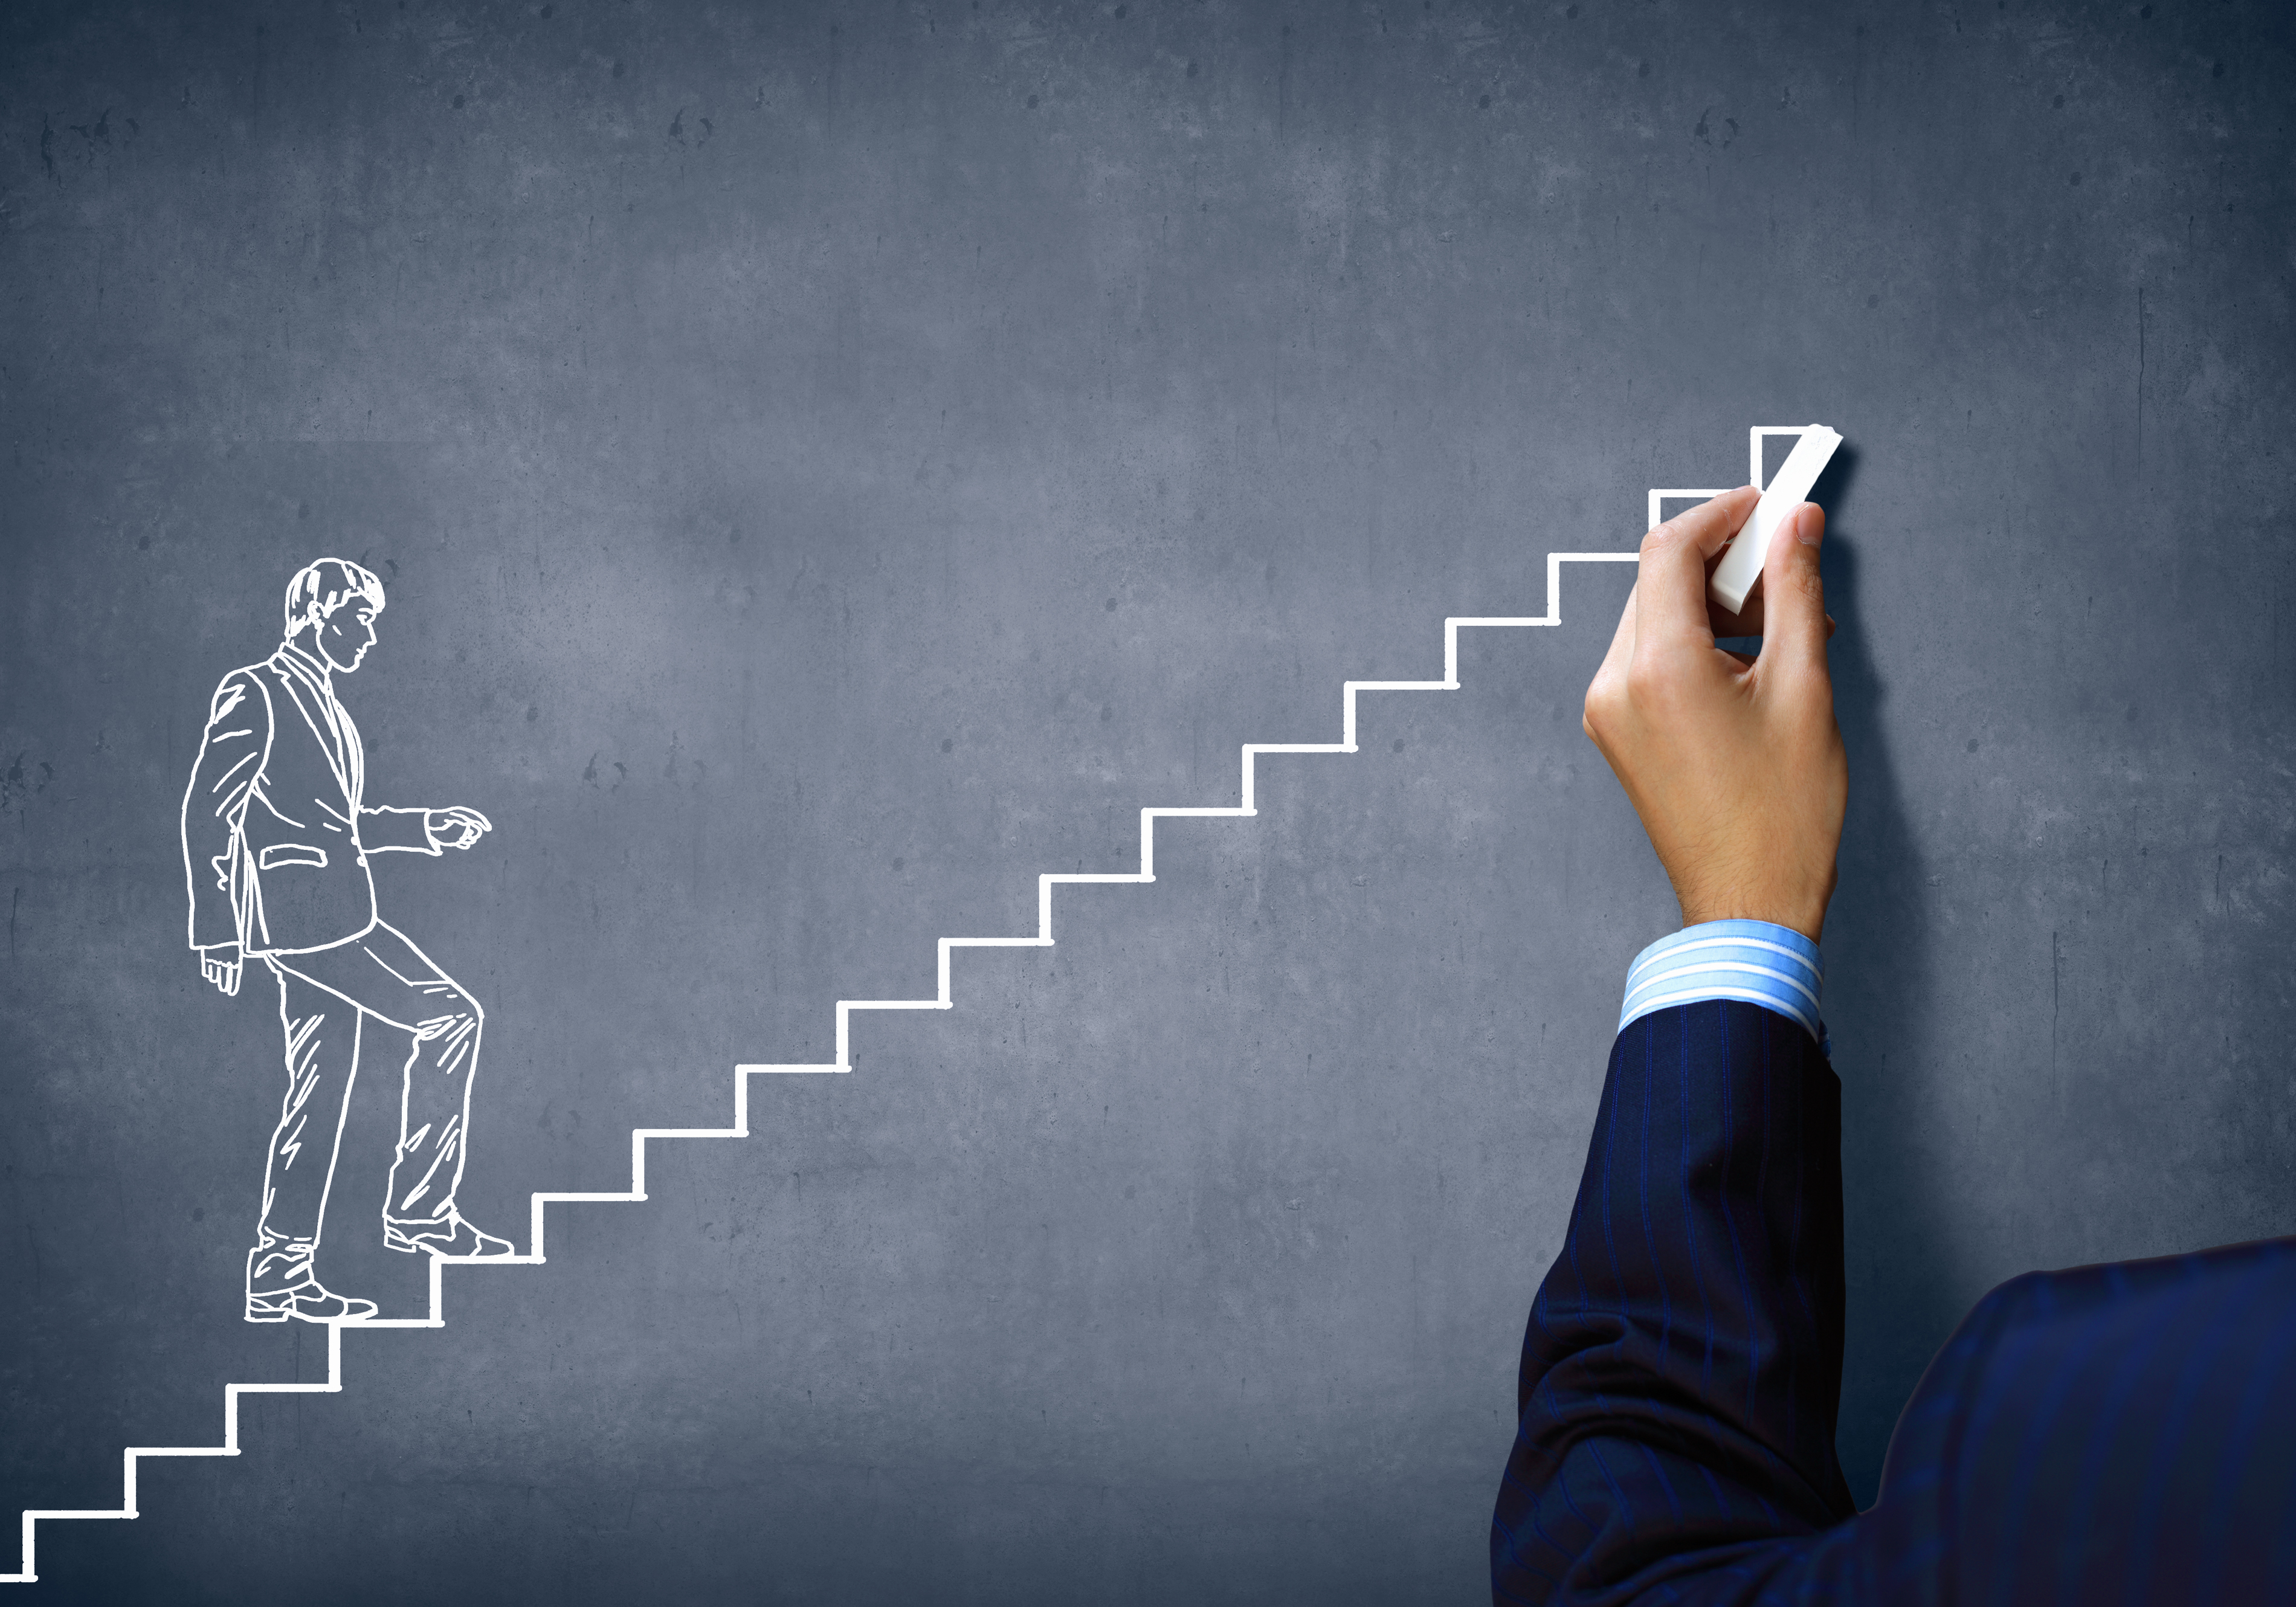 lenovo case study hill international business